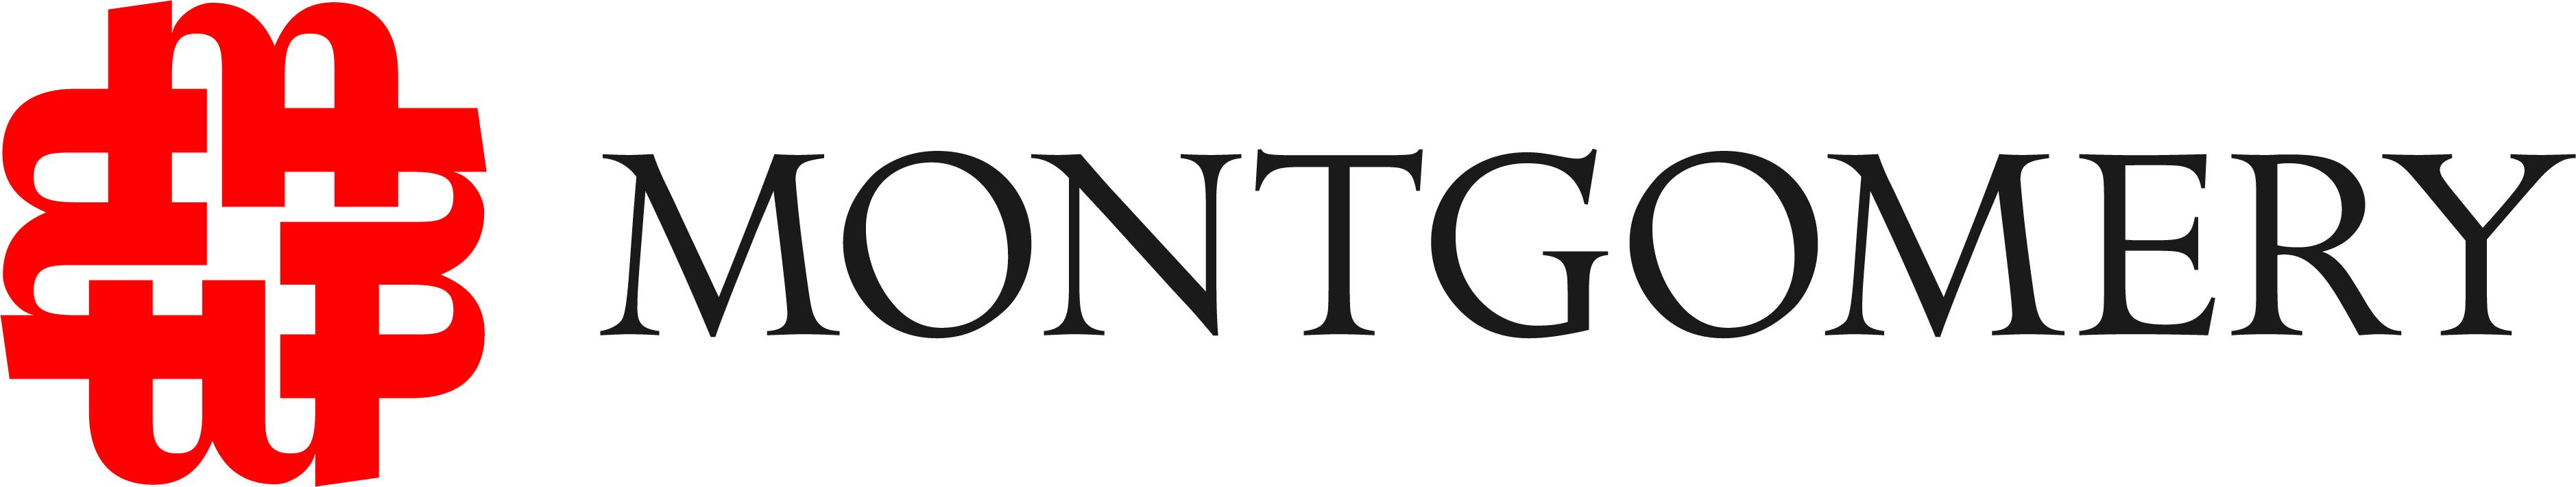 sponsor logo 1